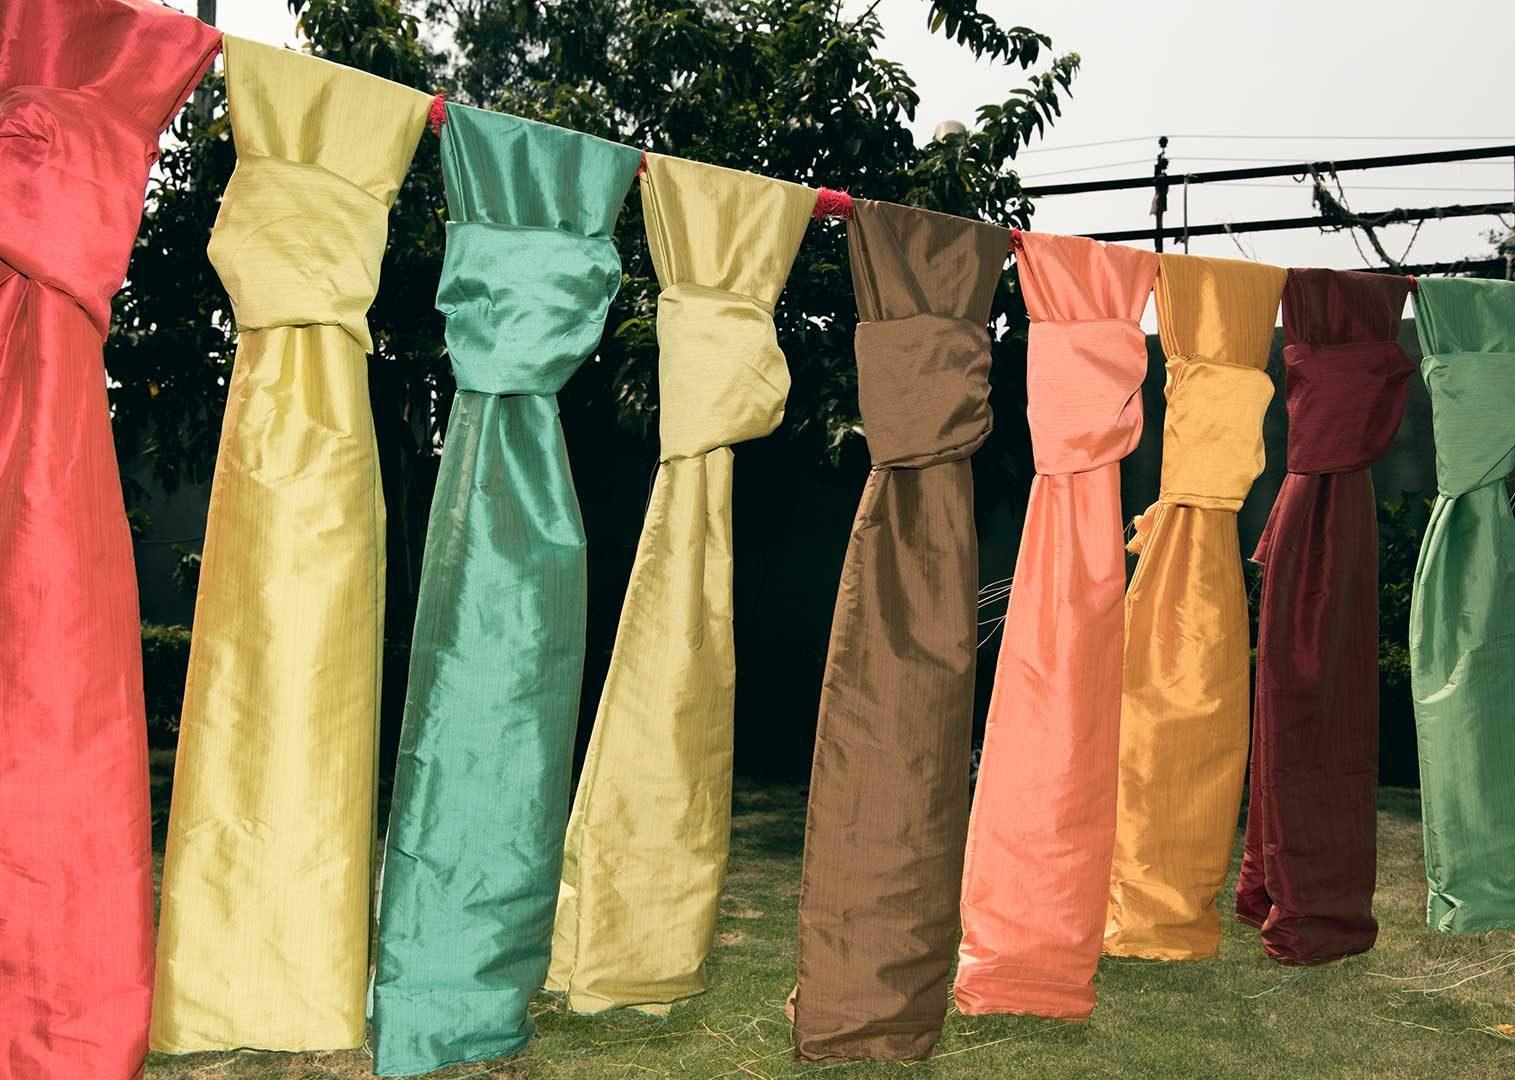 Tulsi Fabrics India Pvt. Ltd. - Leading Exporter & Producer of Embroidery Fabrics, Weaving, Home Furnishing and Digital Marketing